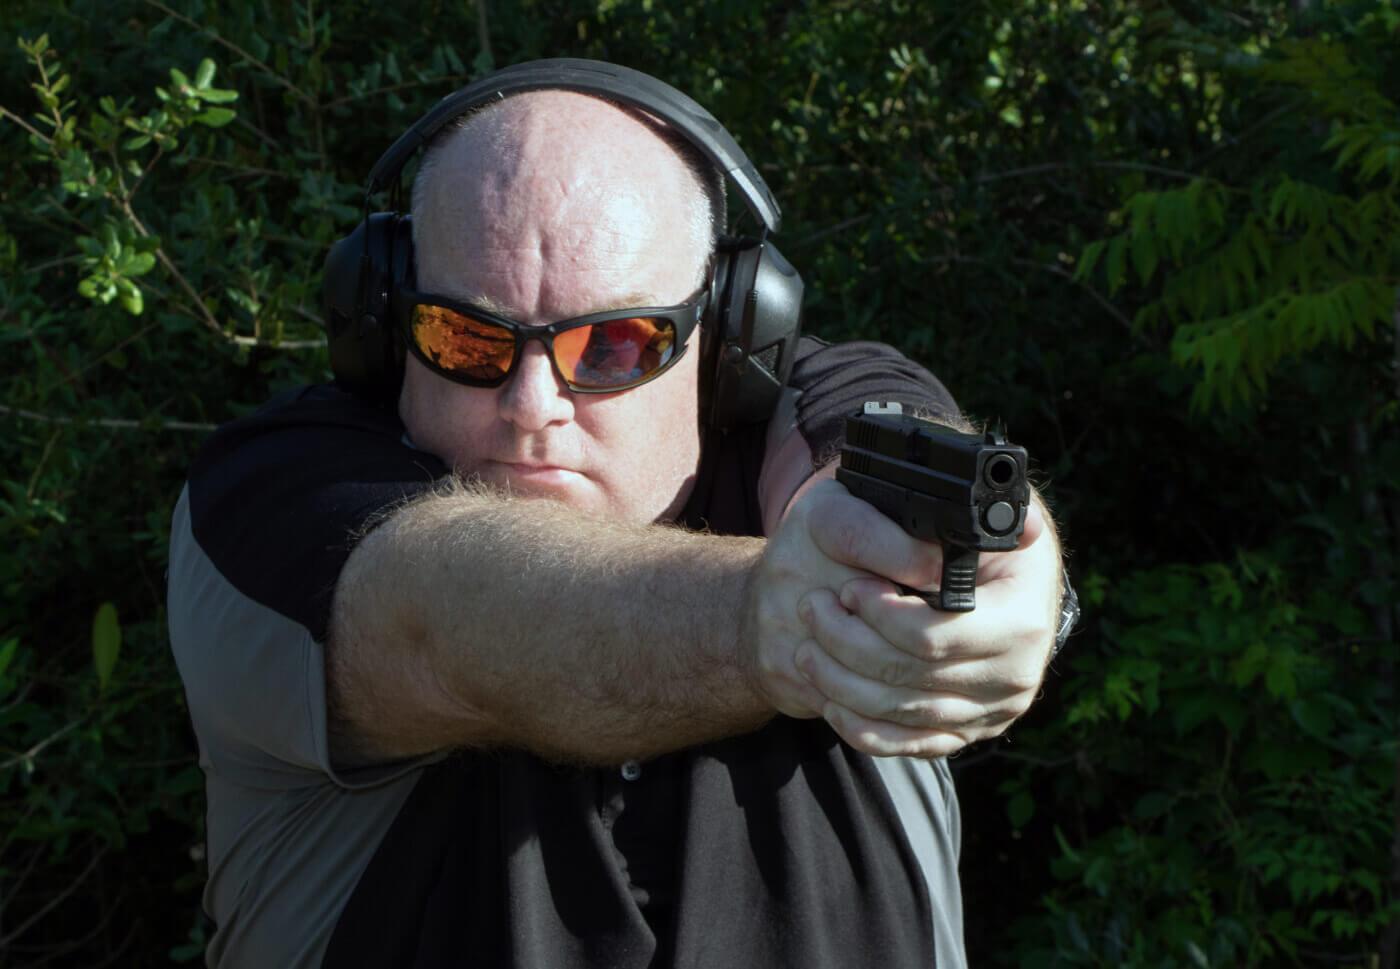 Man shooting the Springfield XD Sub-Compact